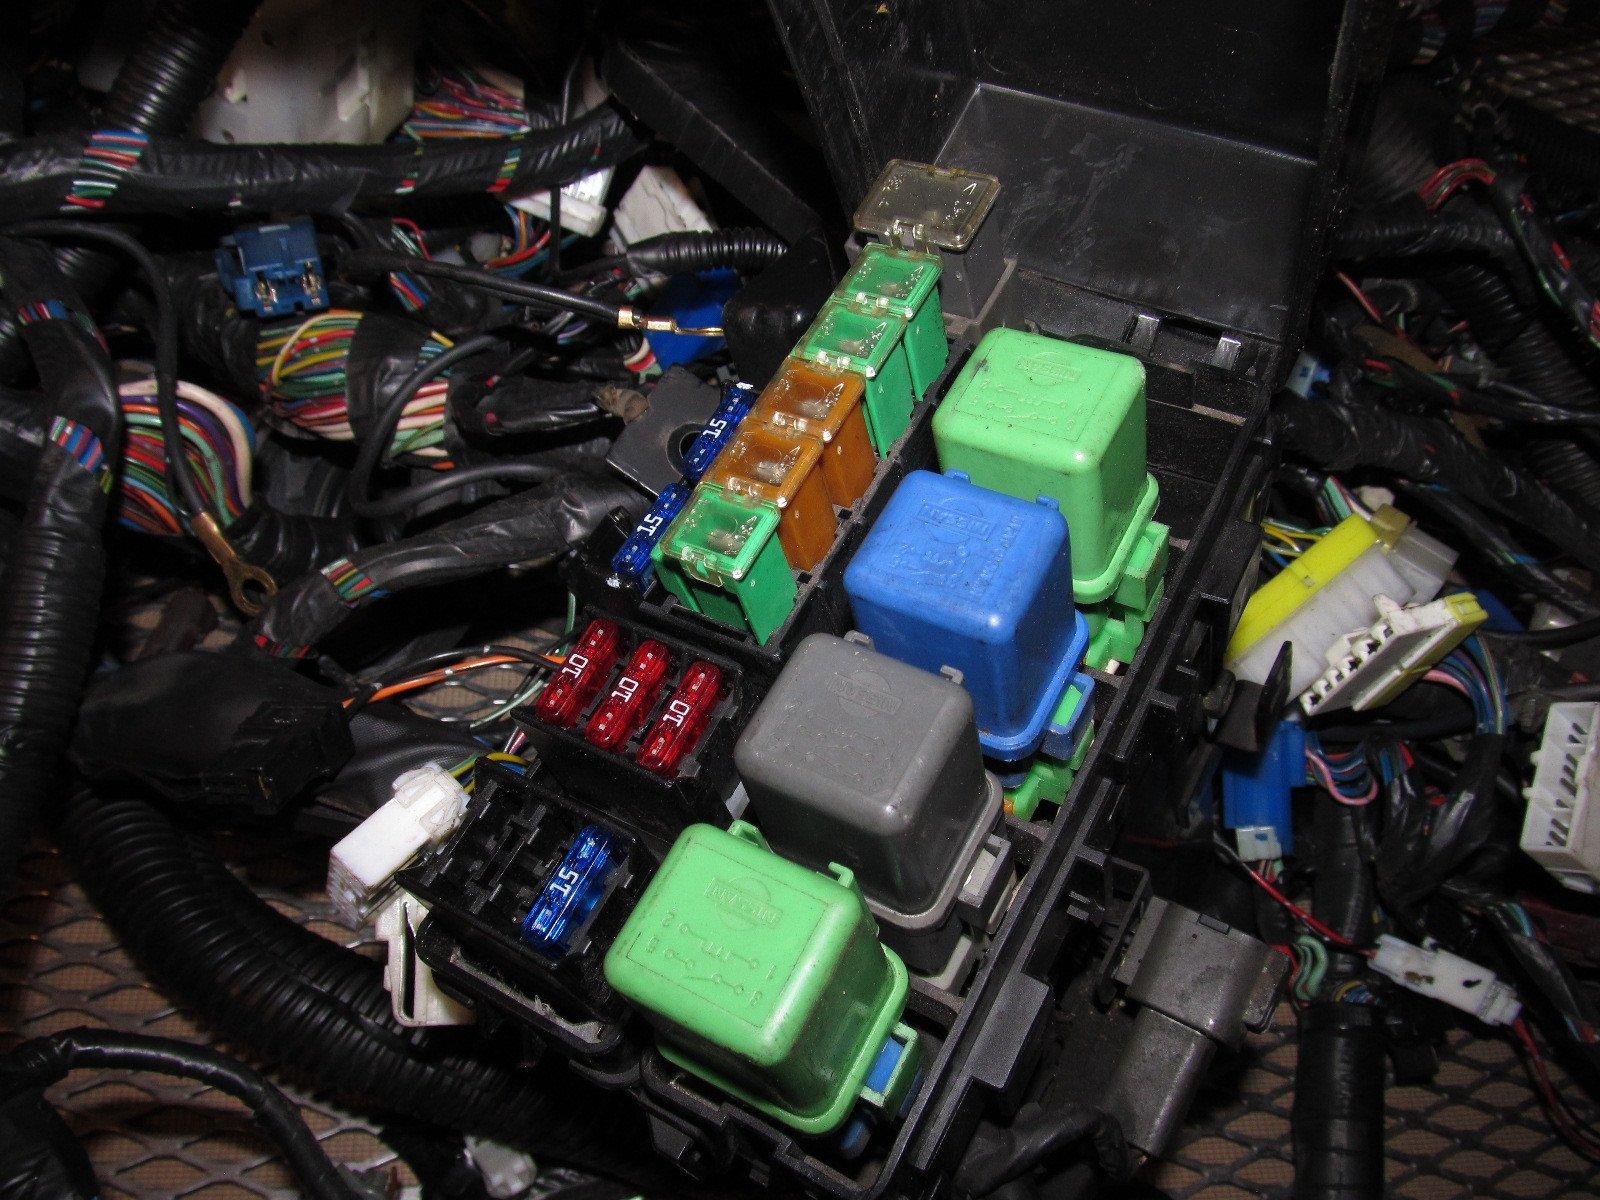 [DIAGRAM_3US]  HV_0674] Nissan 240Sx Fuse Box Diagram S13 Kick Panel Fuse Diagram Nissan Wiring  Diagram | 240sx Headlight Relay Wiring Diagram |  | Loida Umng Mohammedshrine Librar Wiring 101